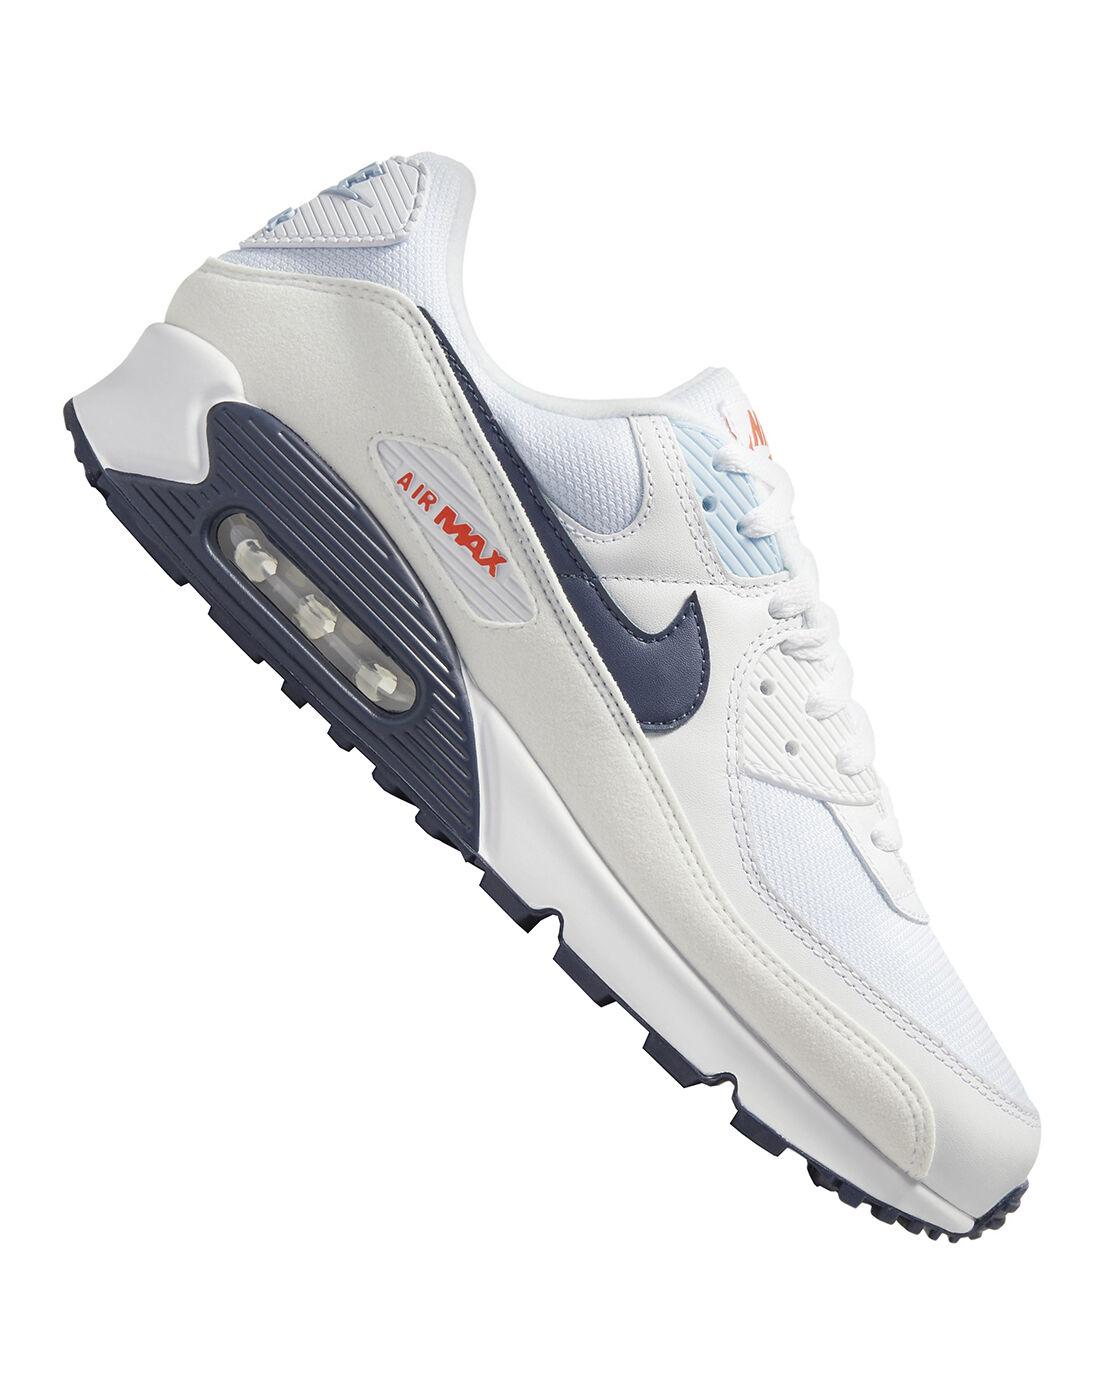 Nike Mens Air Max 90 - White   yeezy season 7 mesh mule boots for ...